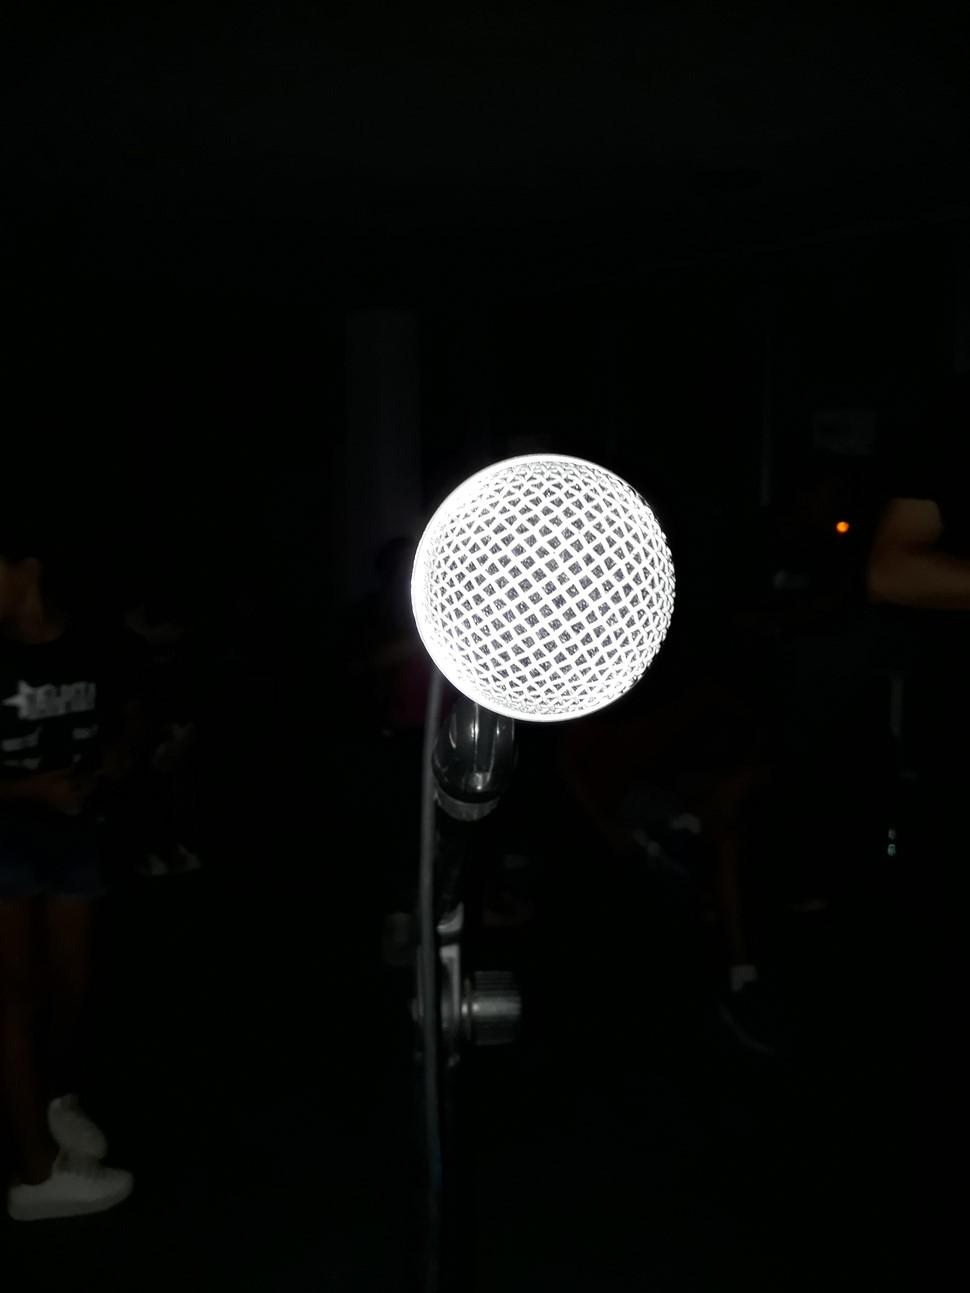 Manuel S Maldita Nera Beach Rock Verano 2017 Luna llena musical en Maldita Beach Rock